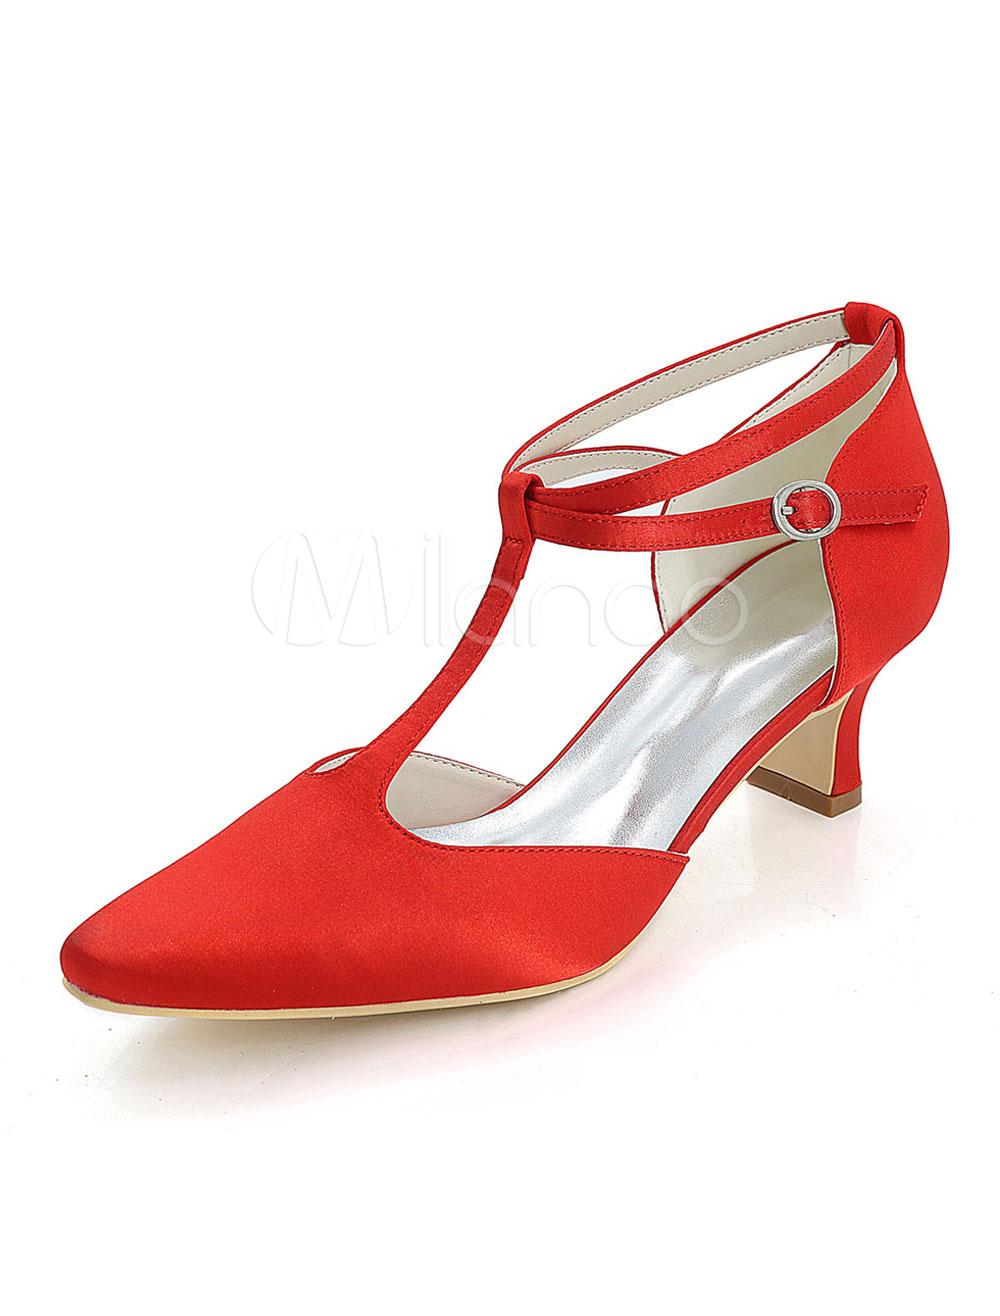 86e71fa3a712a Rote Hochzeitsschuhe Großhandel Rote Hochzeitsschuhe Online ...